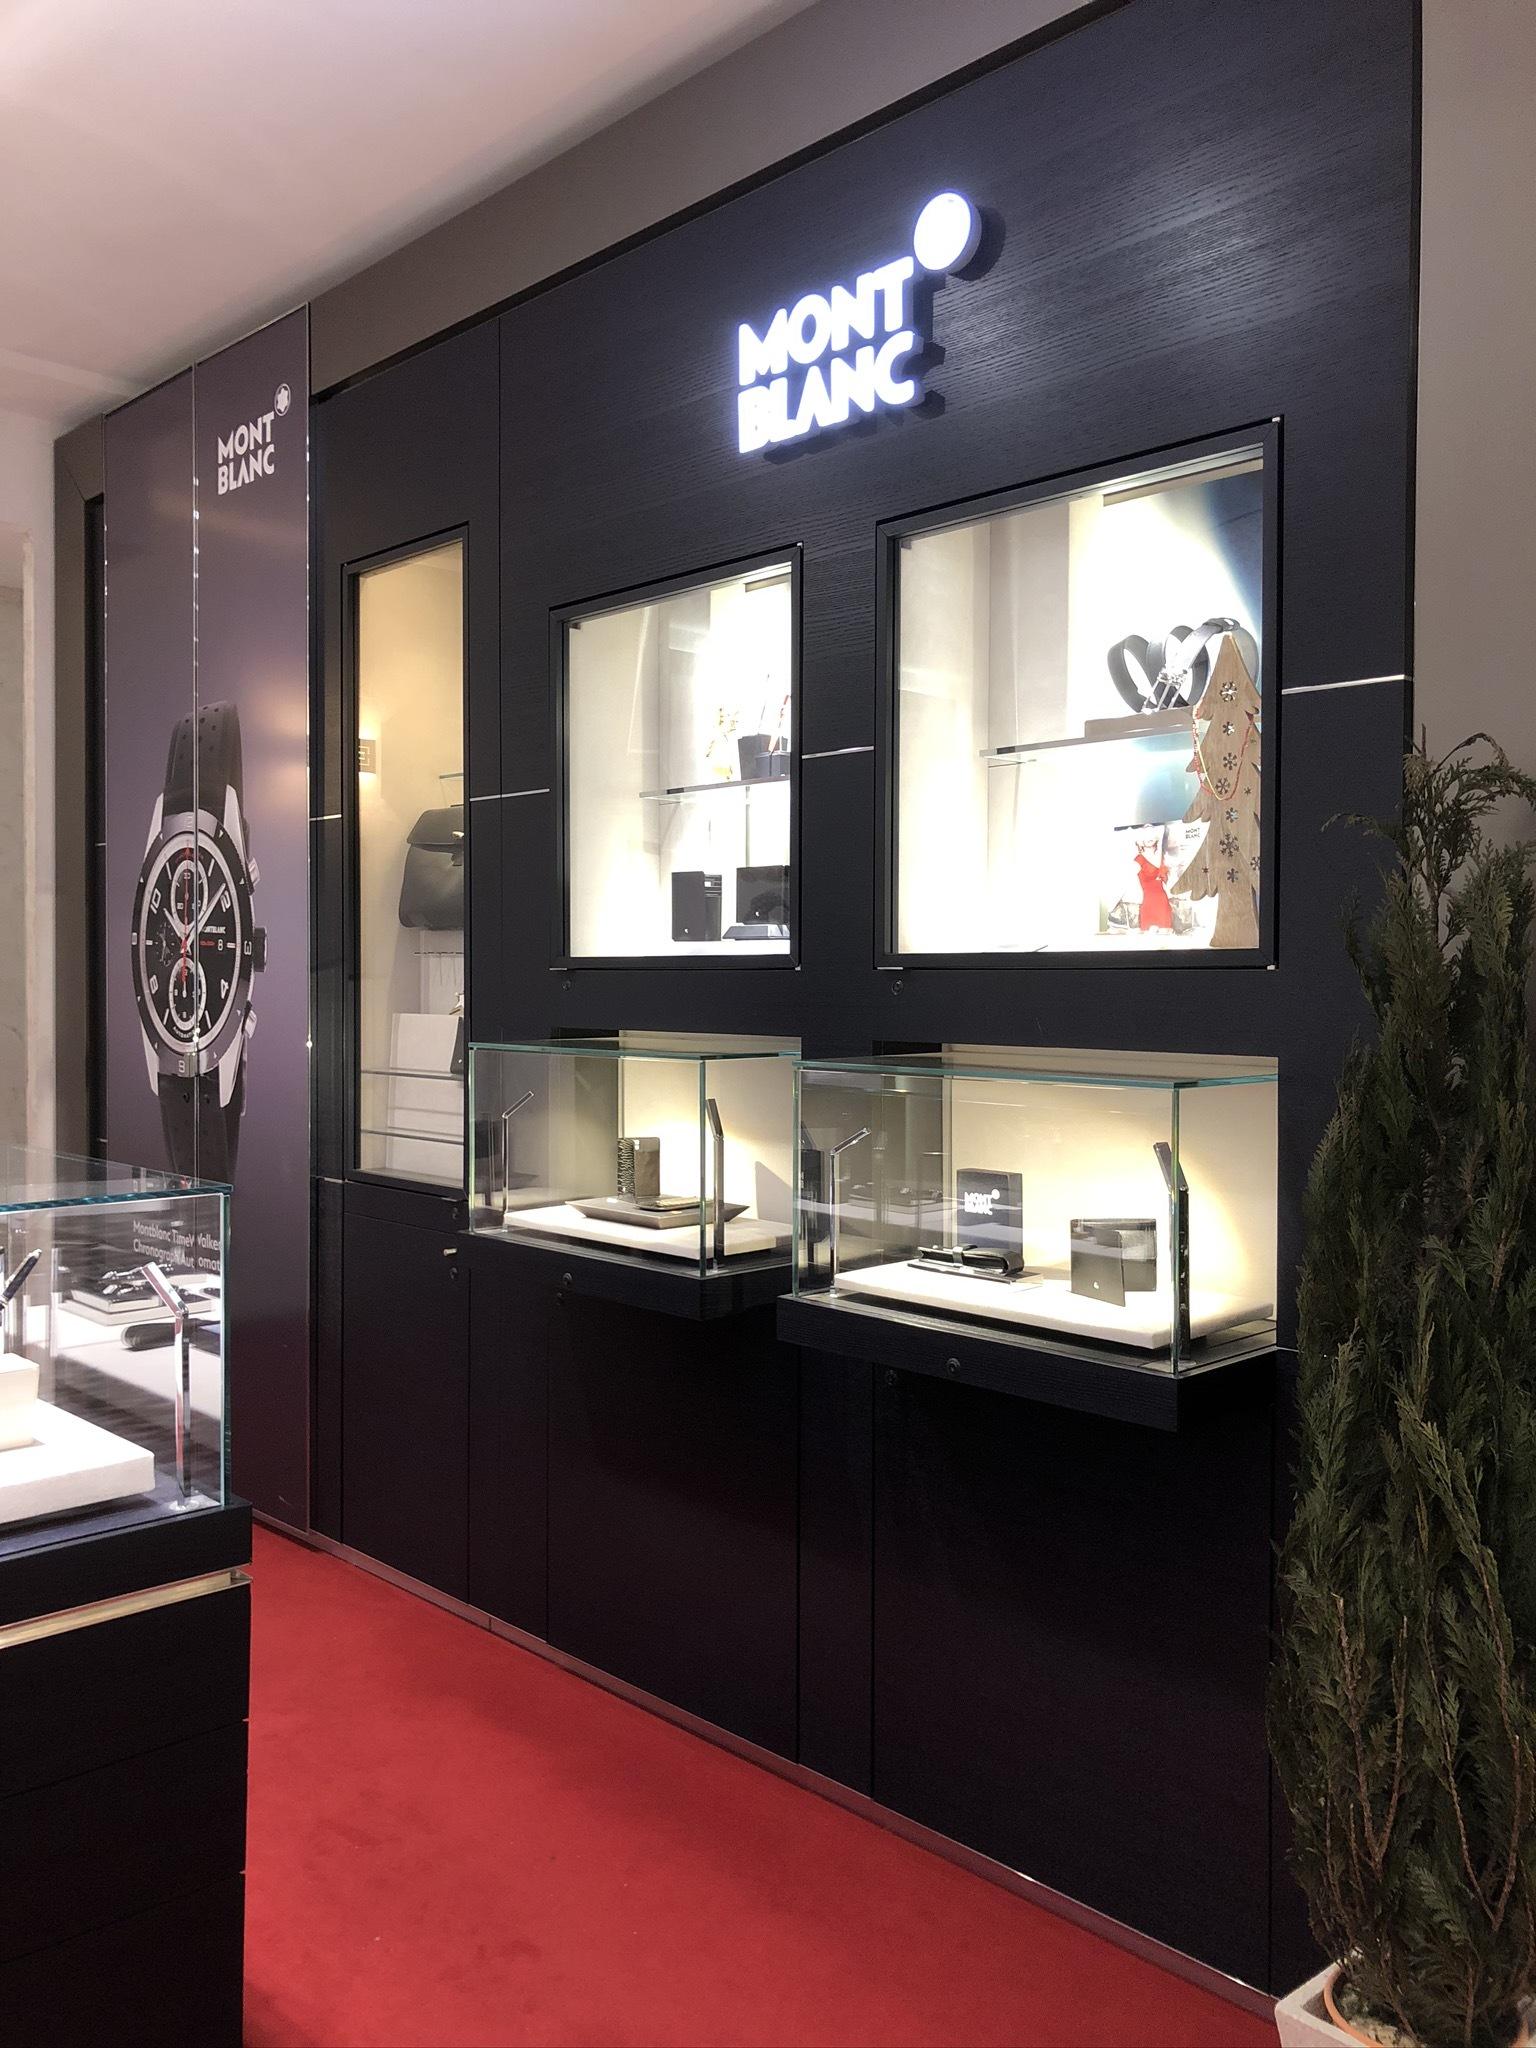 Galerie d'image - Bijouterie Anne Daury